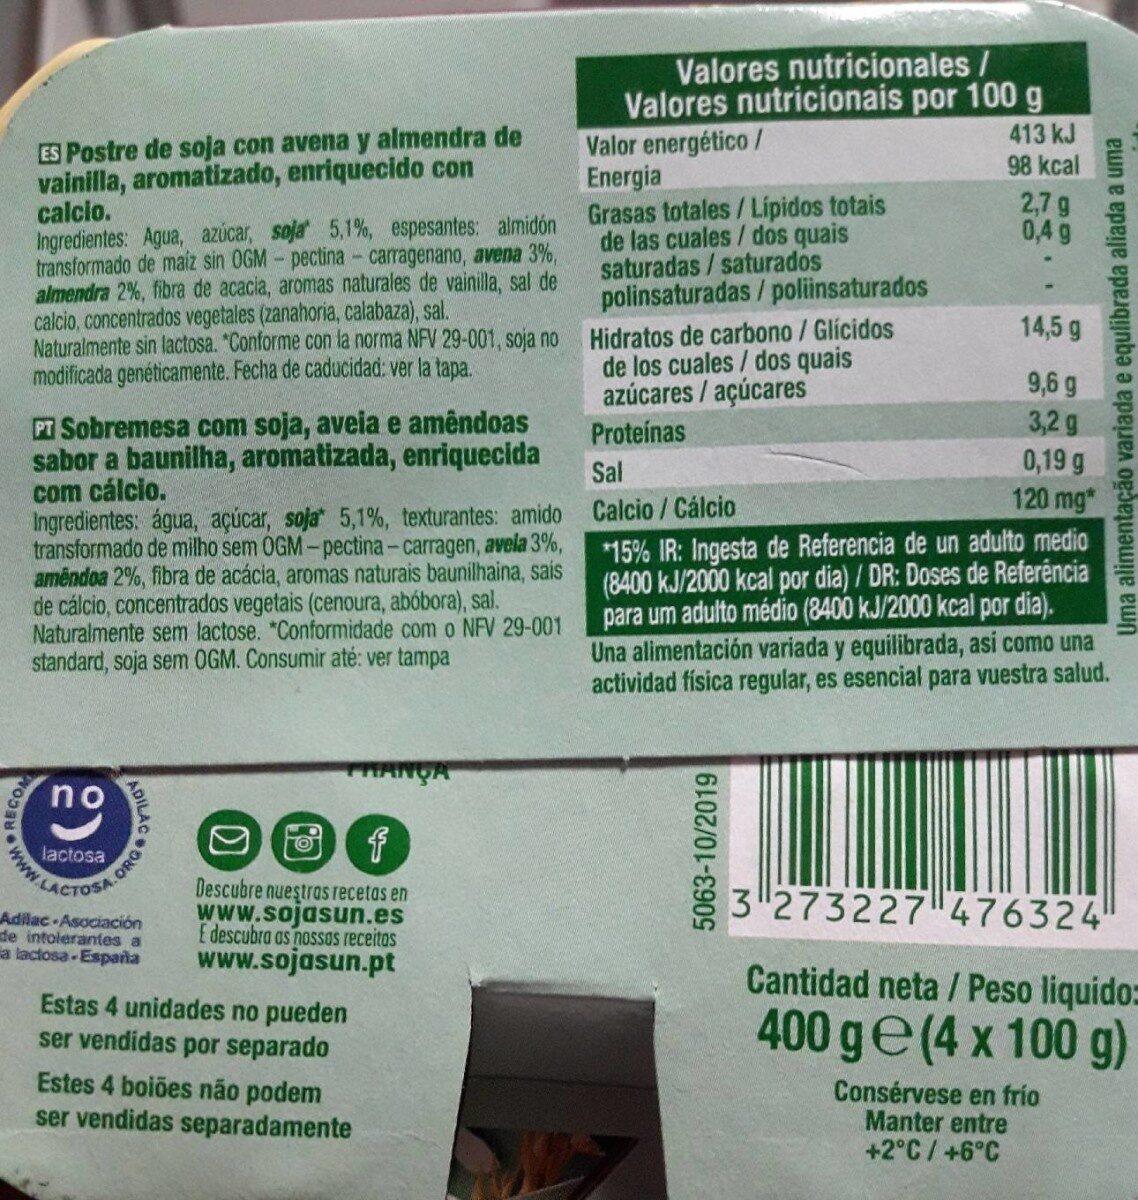 Natillas almendra-avena - Informations nutritionnelles - es